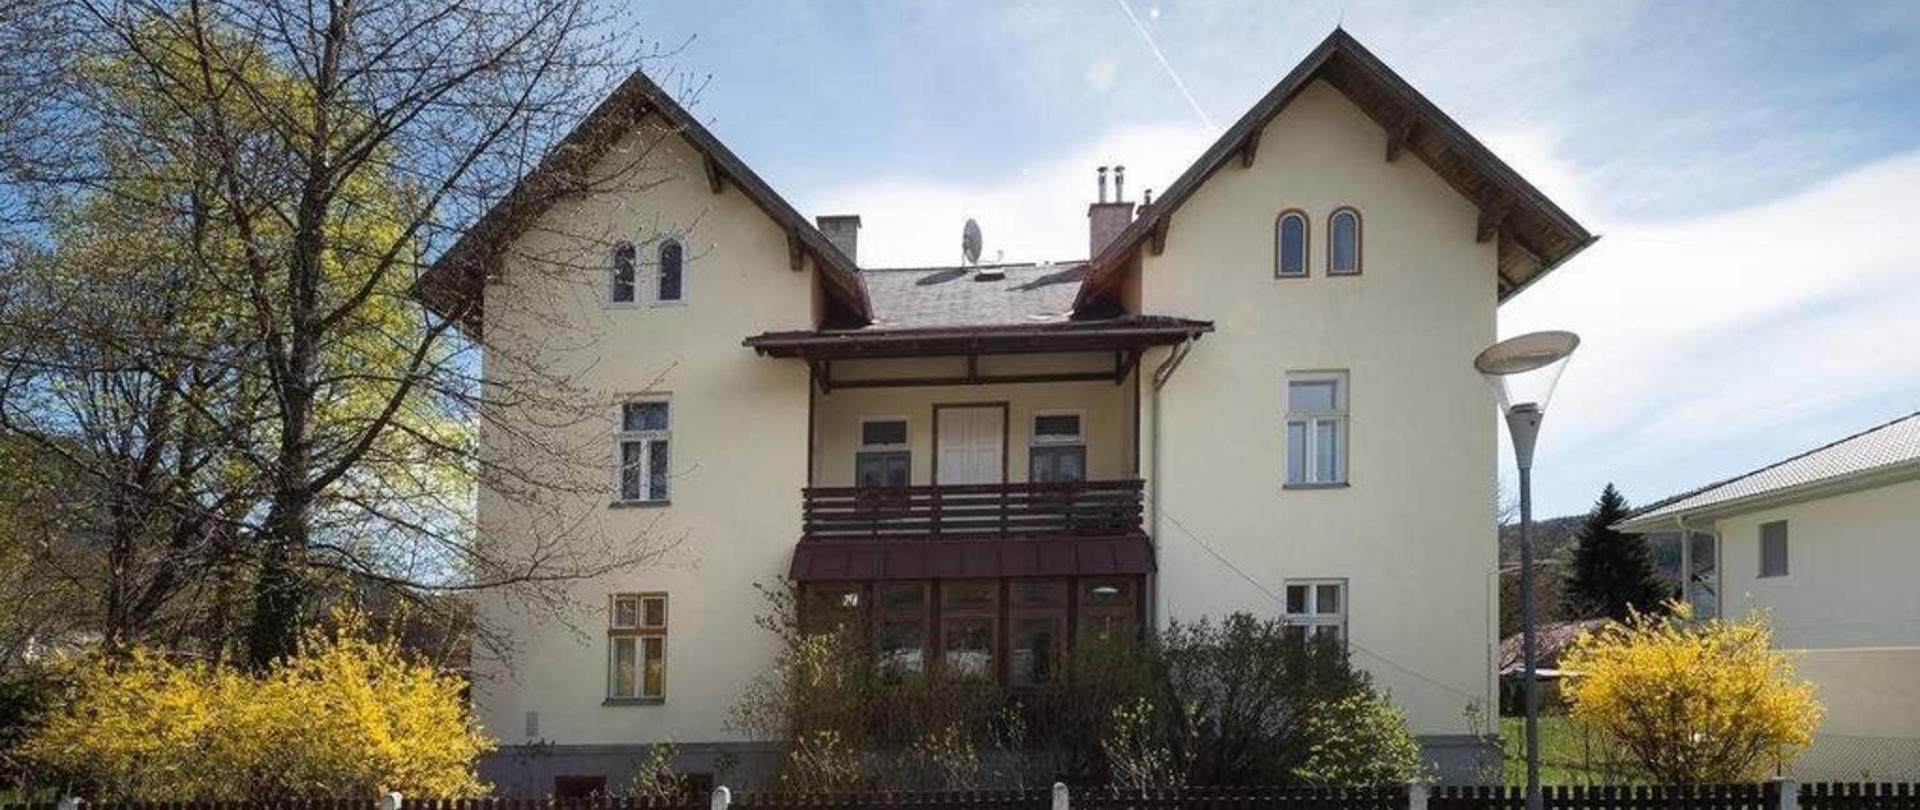 guesthouses Reichenau / Rax - Raxalpe - Bergfex